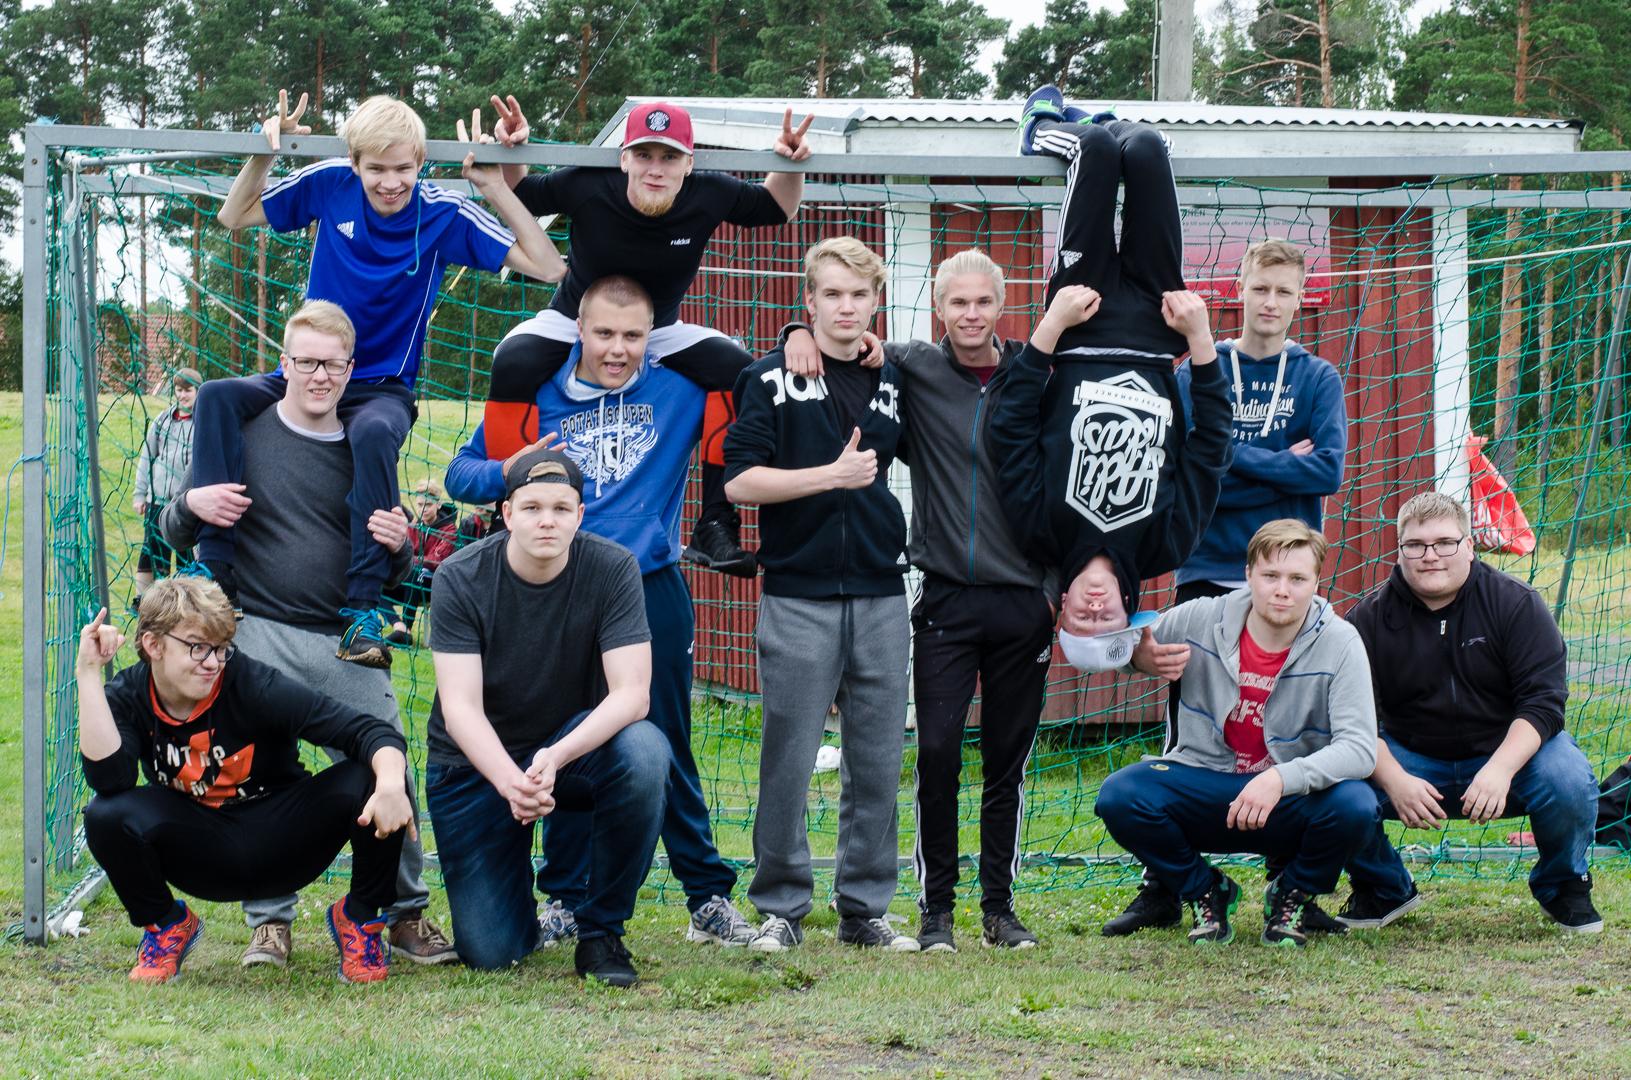 escort service finland ajoneuvorekisterikyselyt